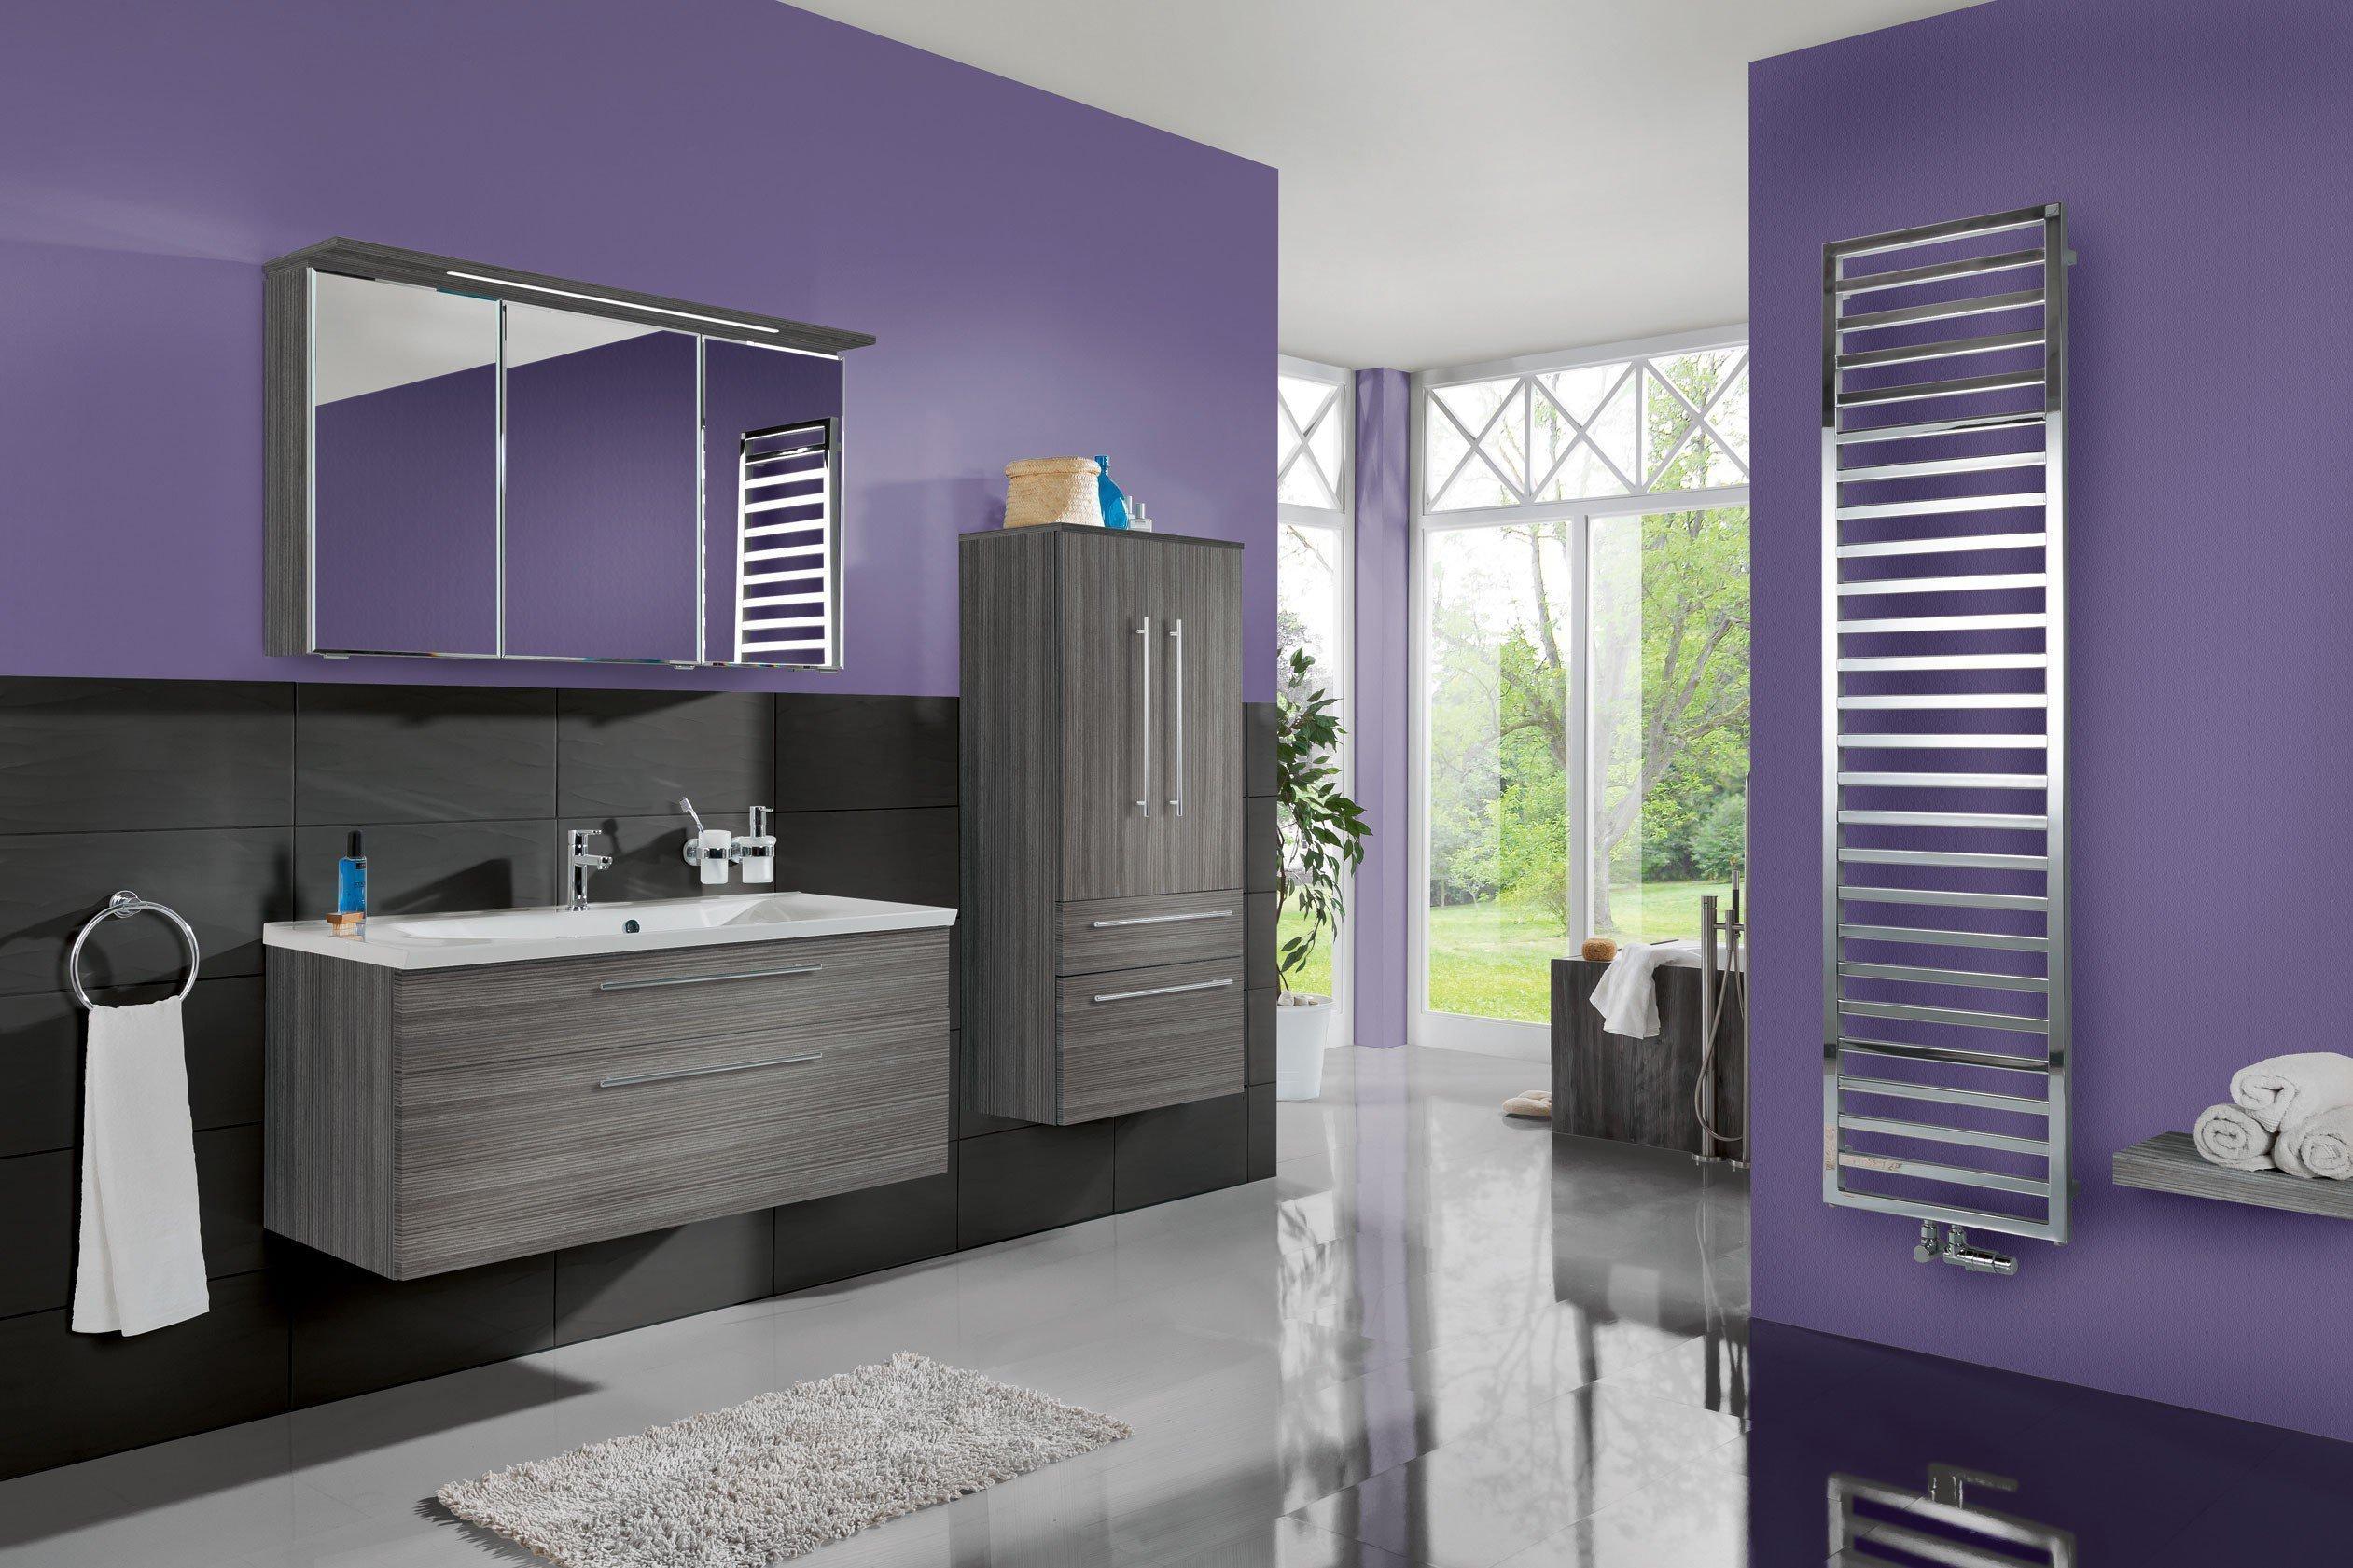 Get Free High Quality HD Wallpapers Badezimmer Qbig